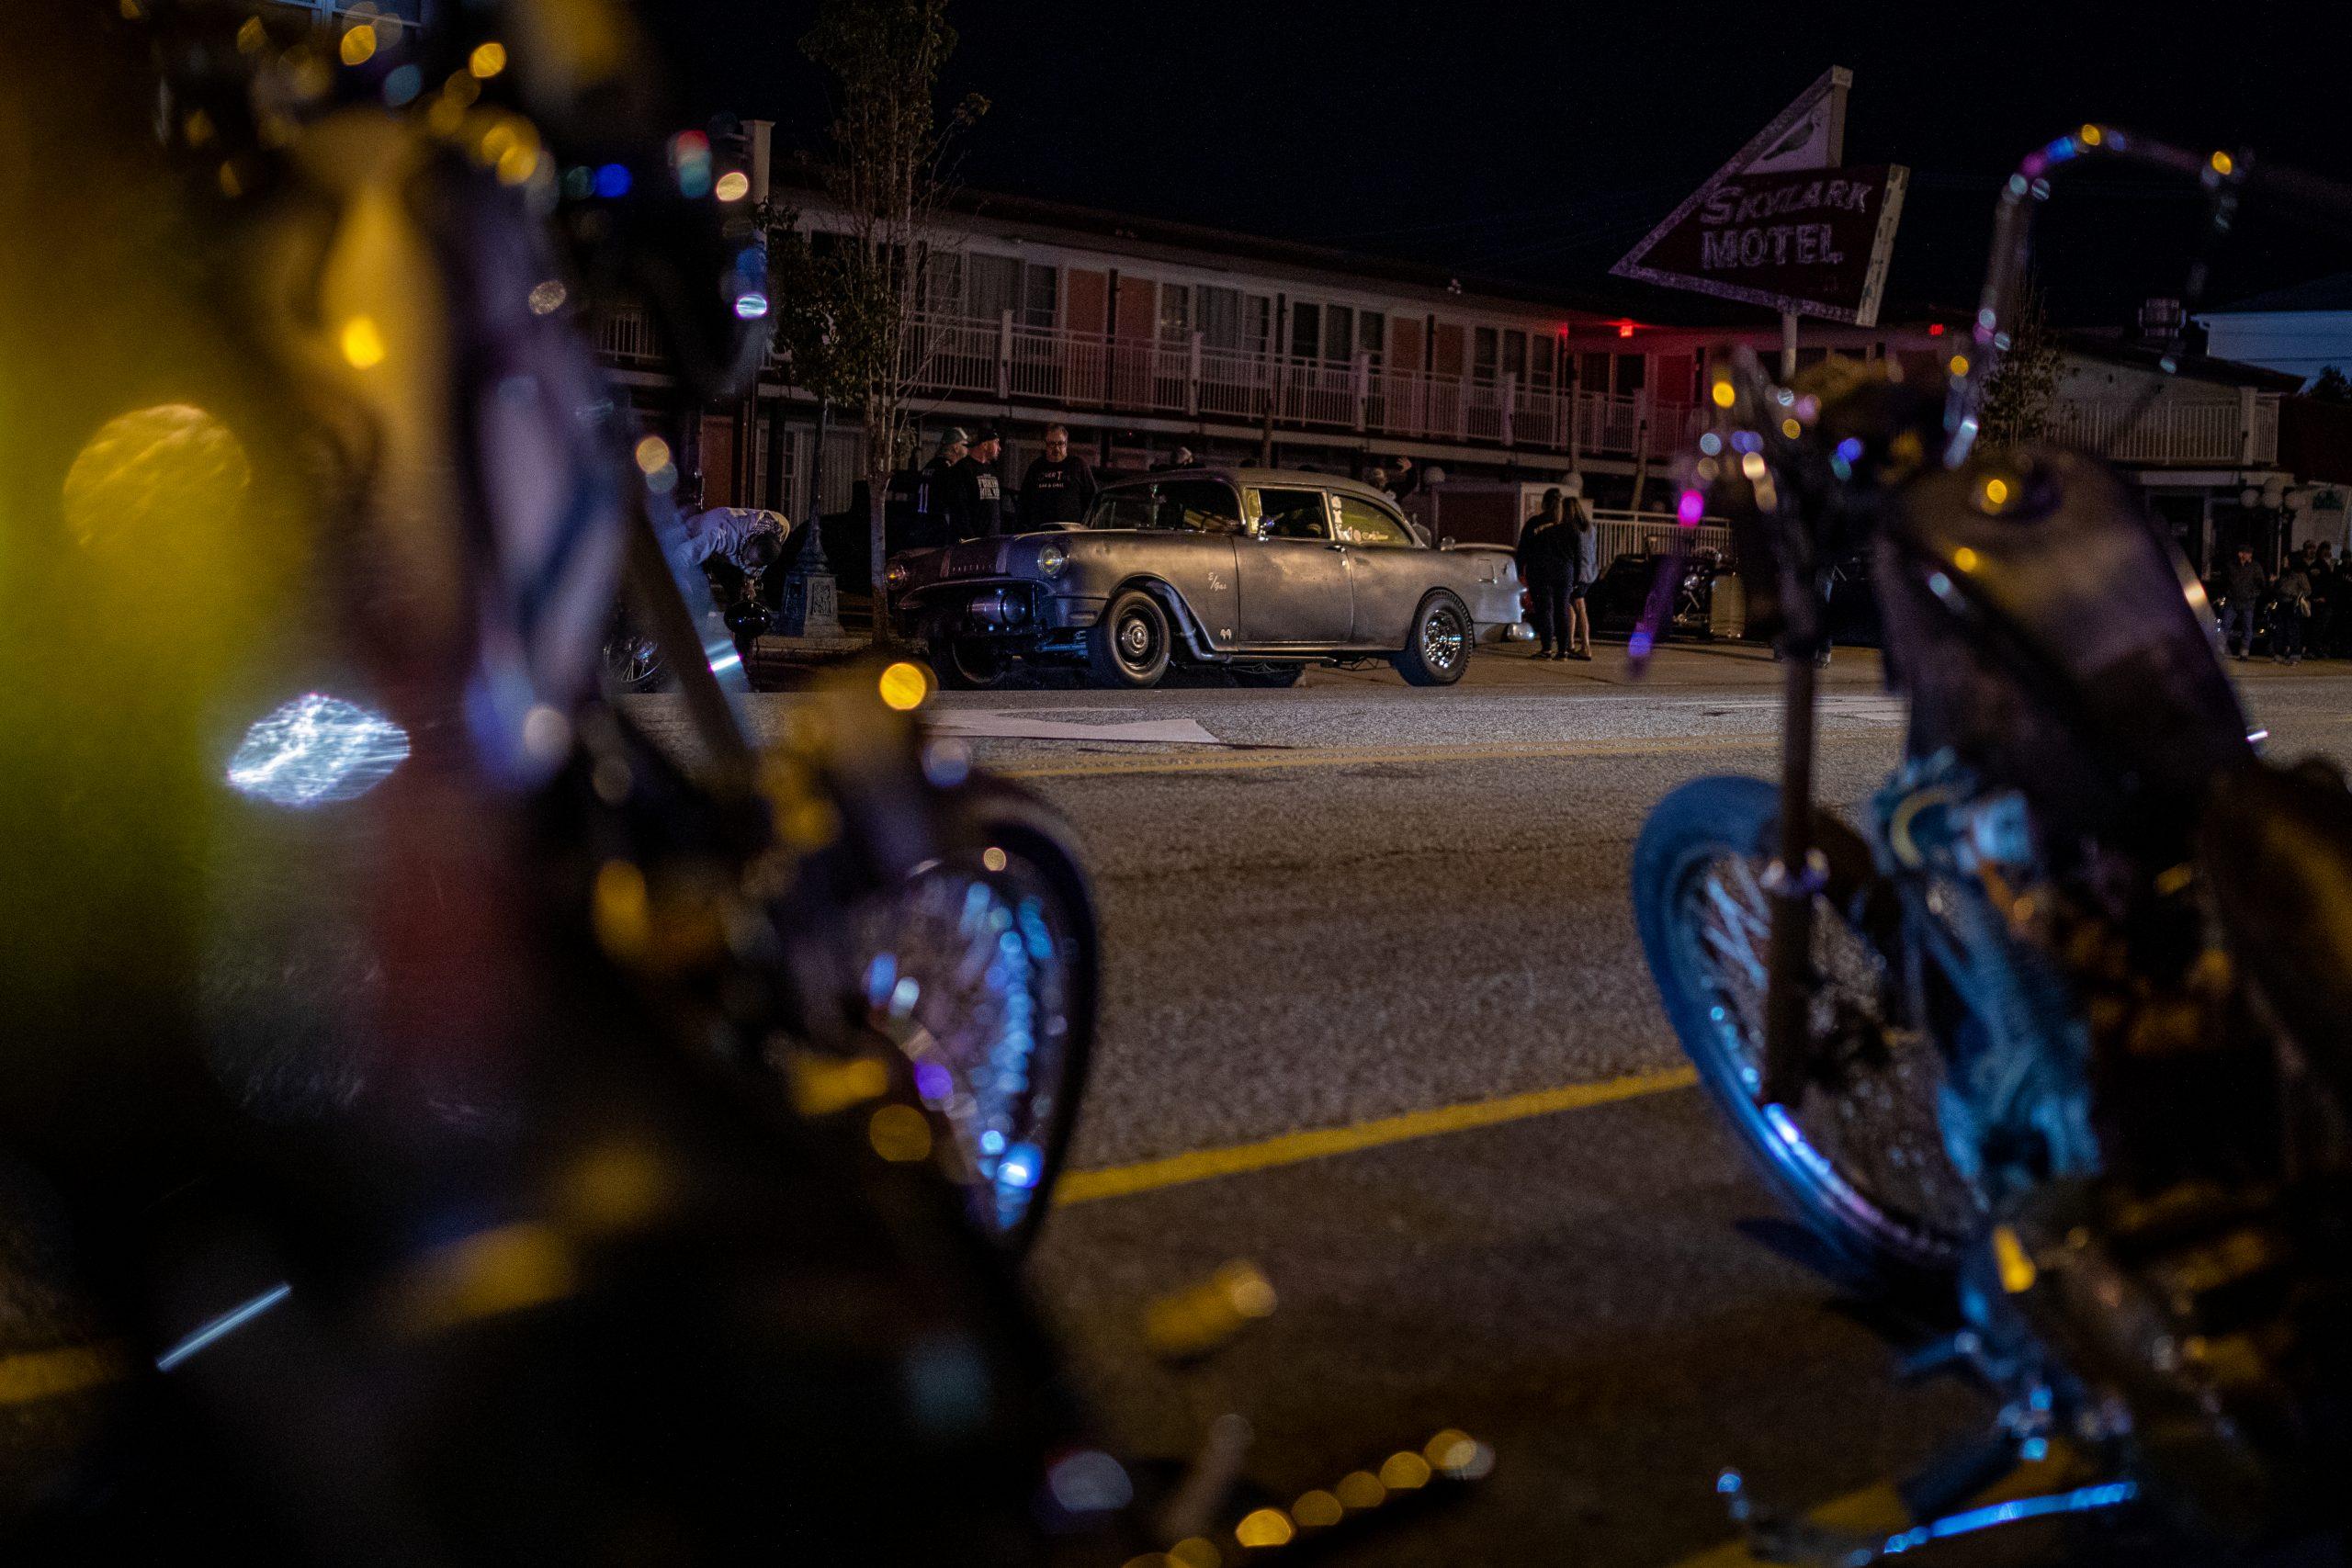 hot rod streets at night